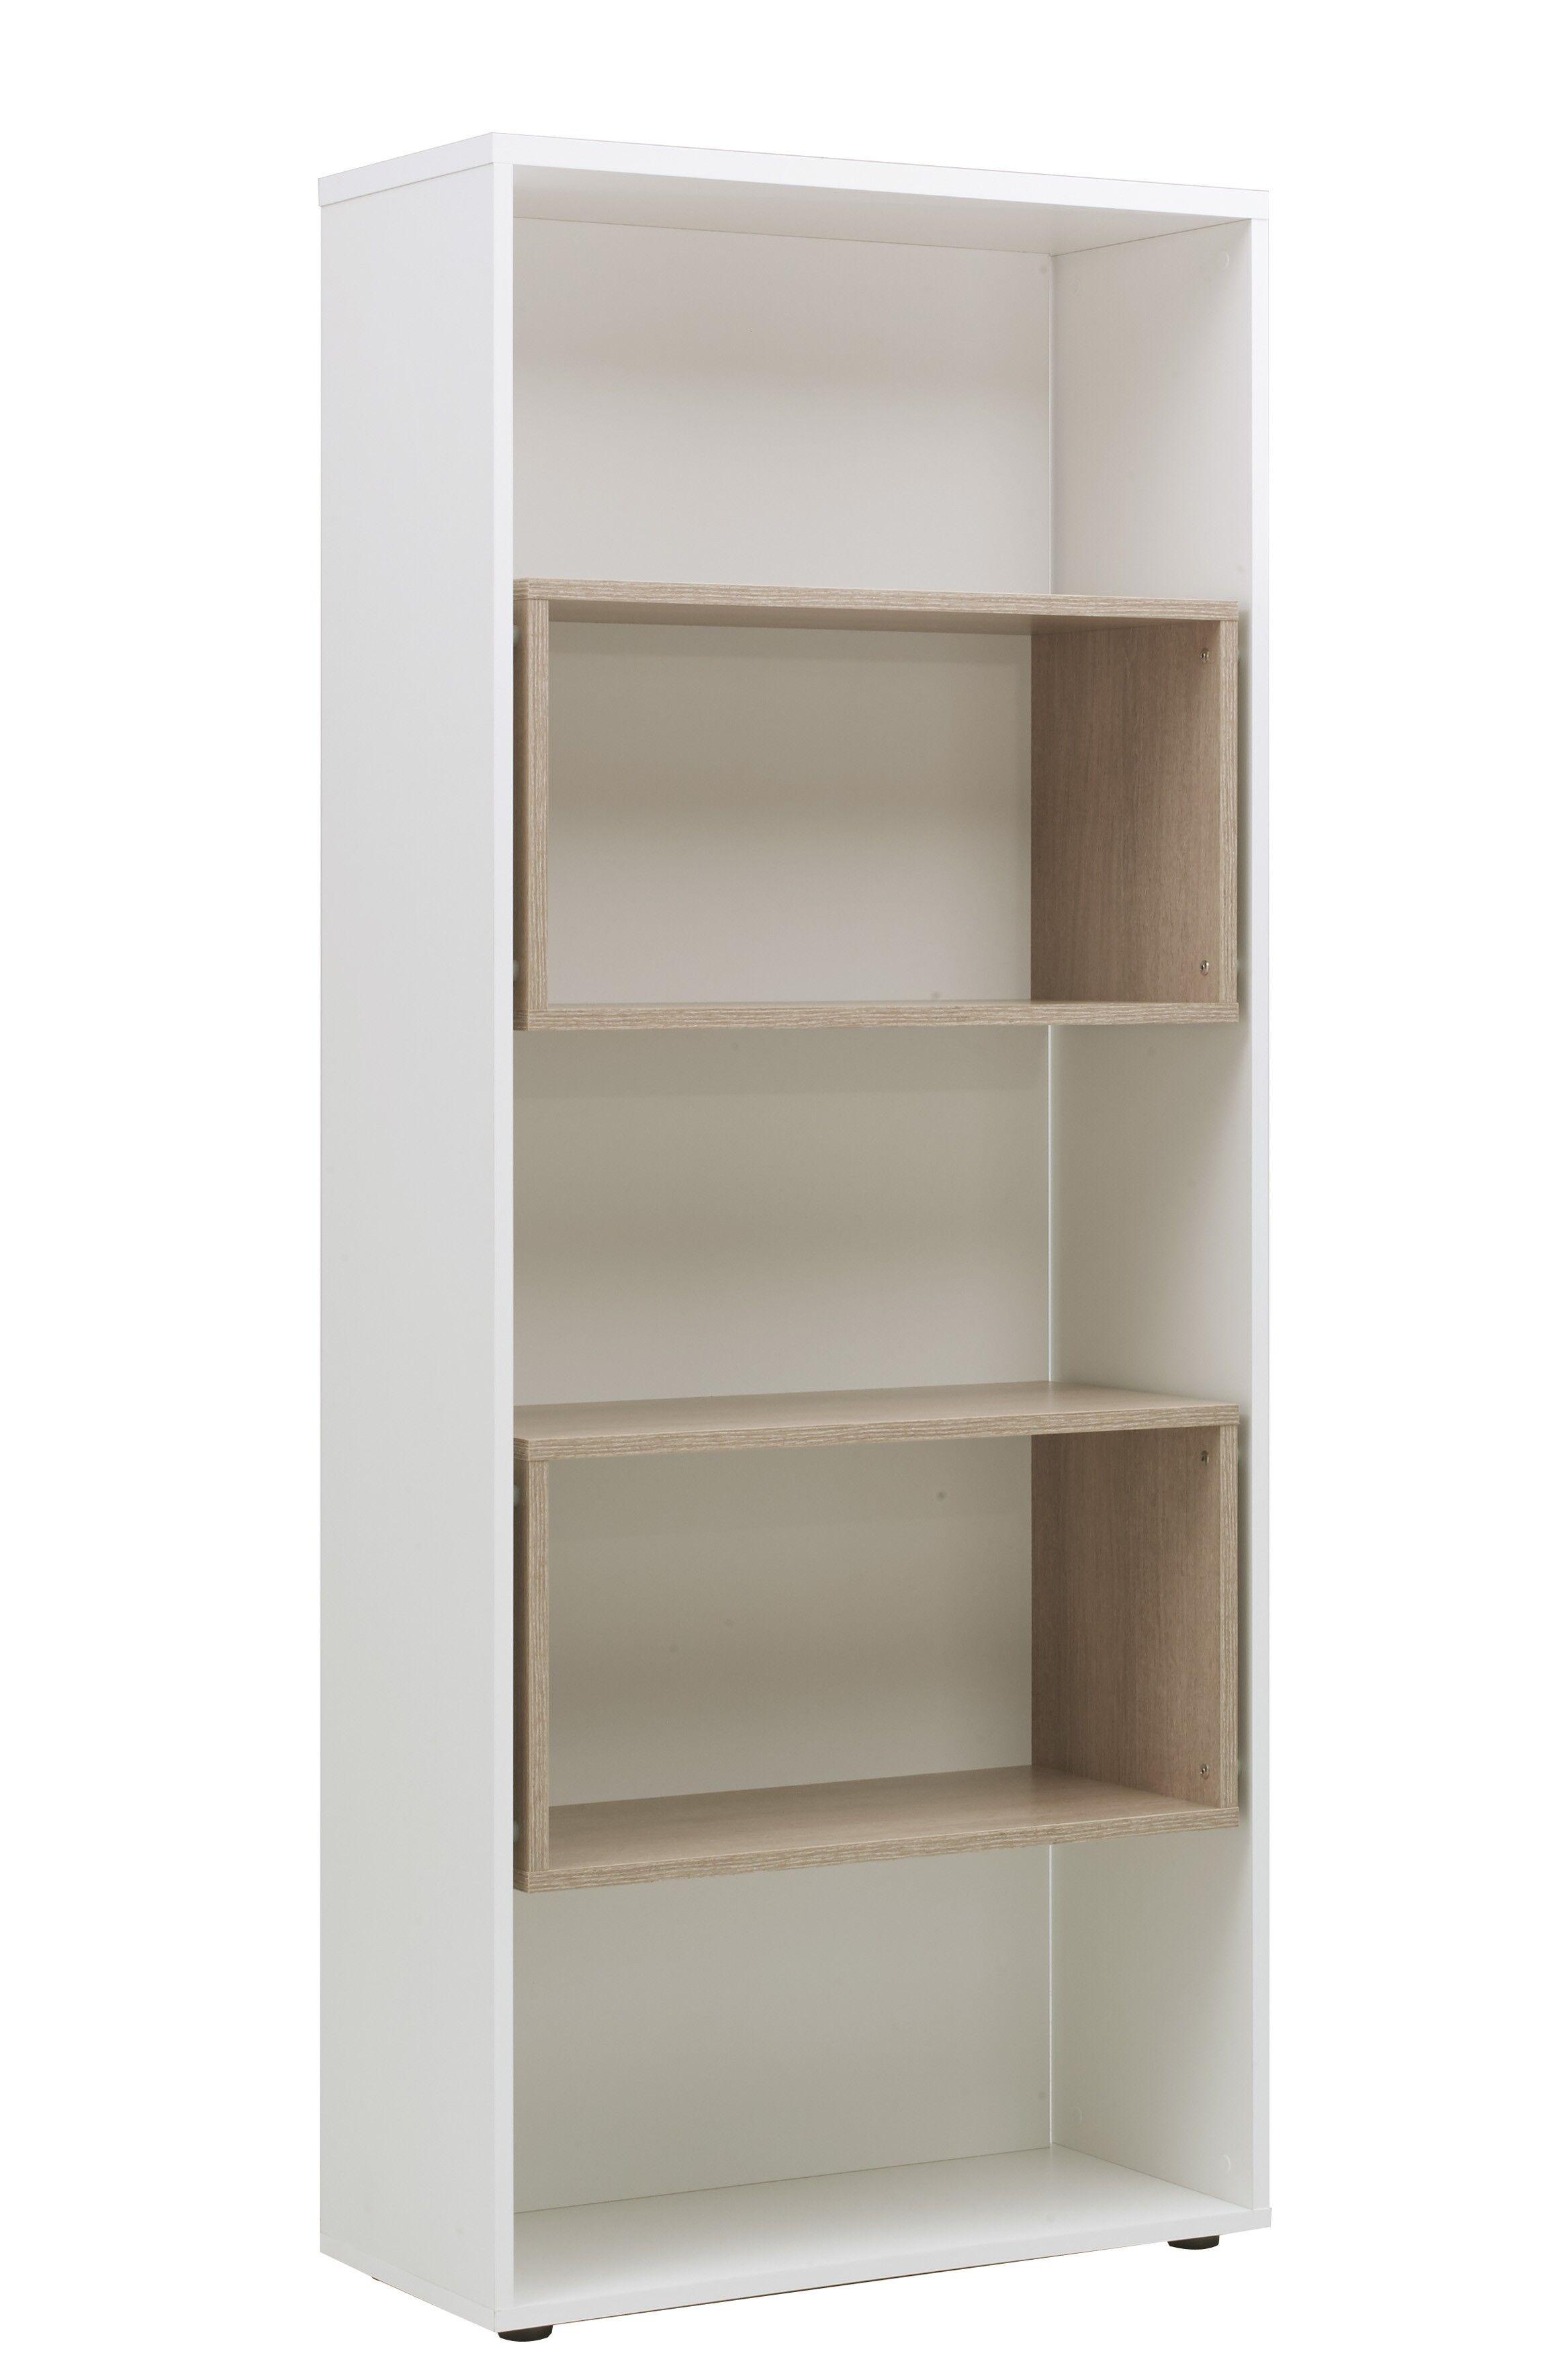 bibliotheque arpe l80 x h190 x p35 chene et blanc